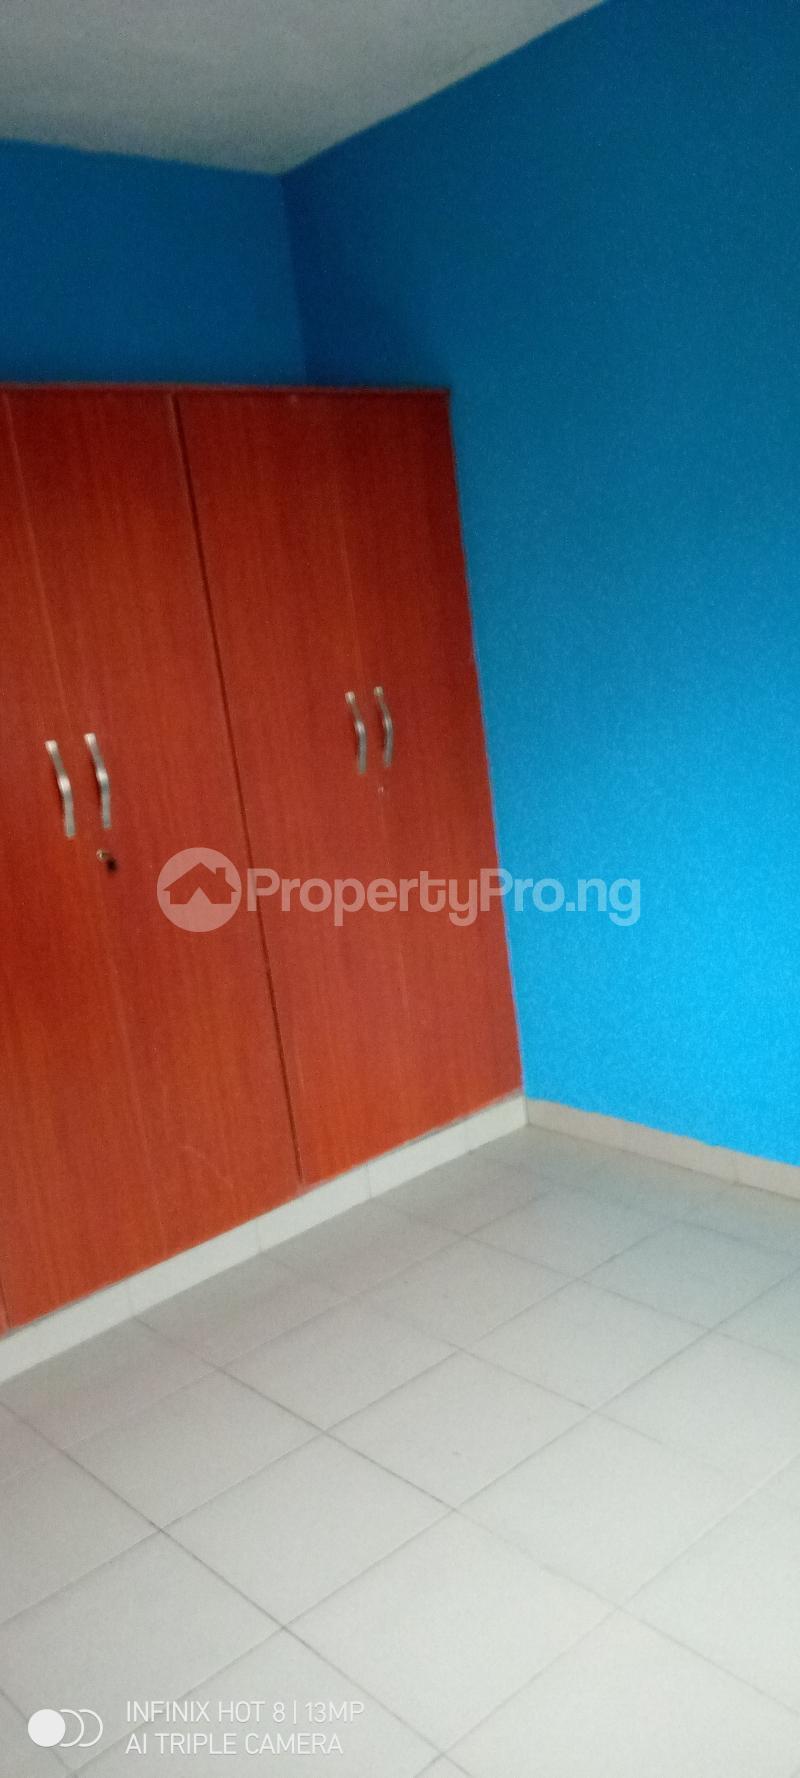 3 bedroom Flat / Apartment for rent Green field estate Amuwo Odofin Amuwo Odofin Lagos - 5